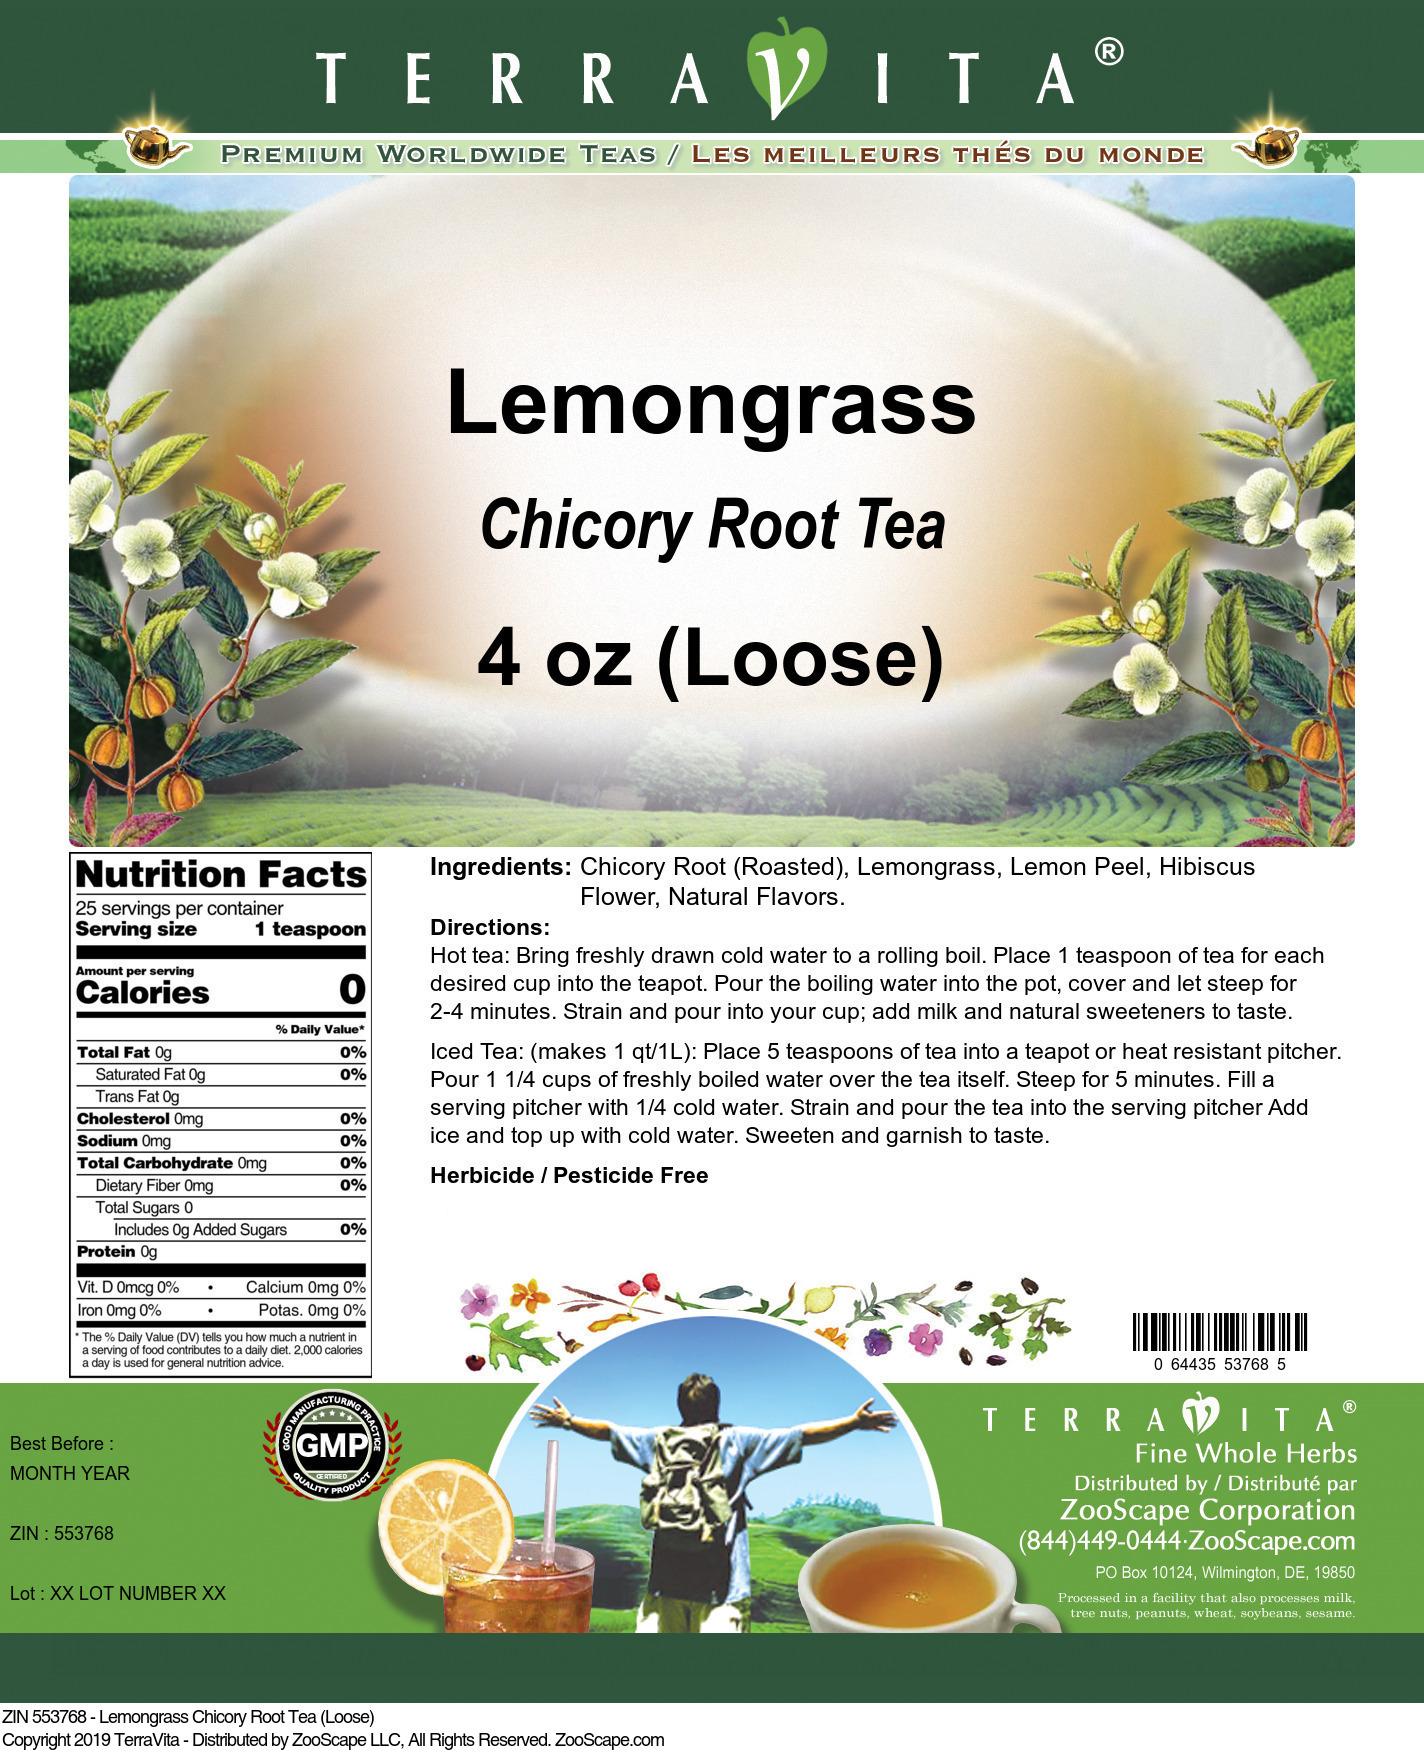 Lemongrass Chicory Root Tea (Loose)